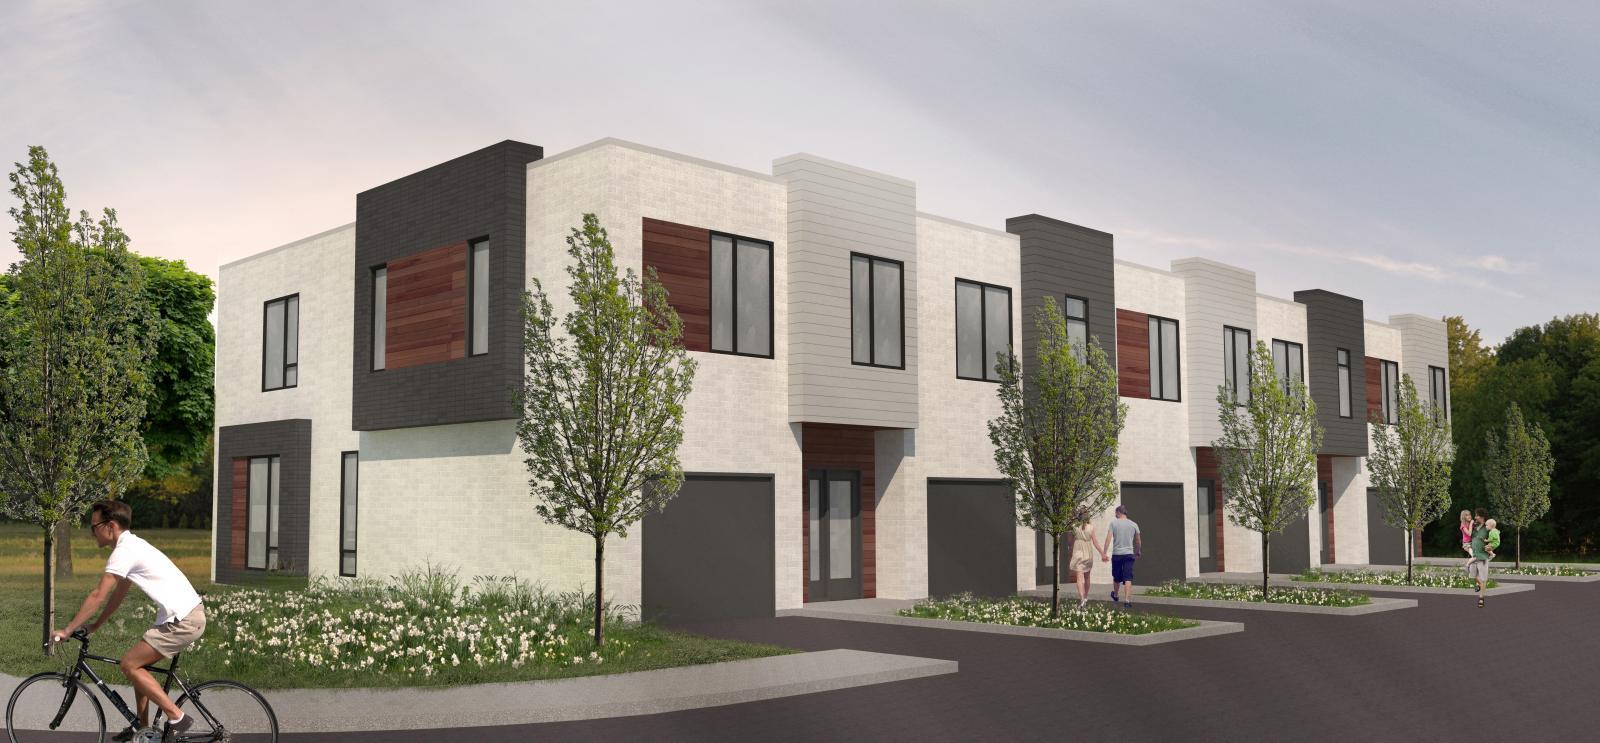 Elegant les habitats urbains groupe mathieu maisons neuves for Maison moderne nancy